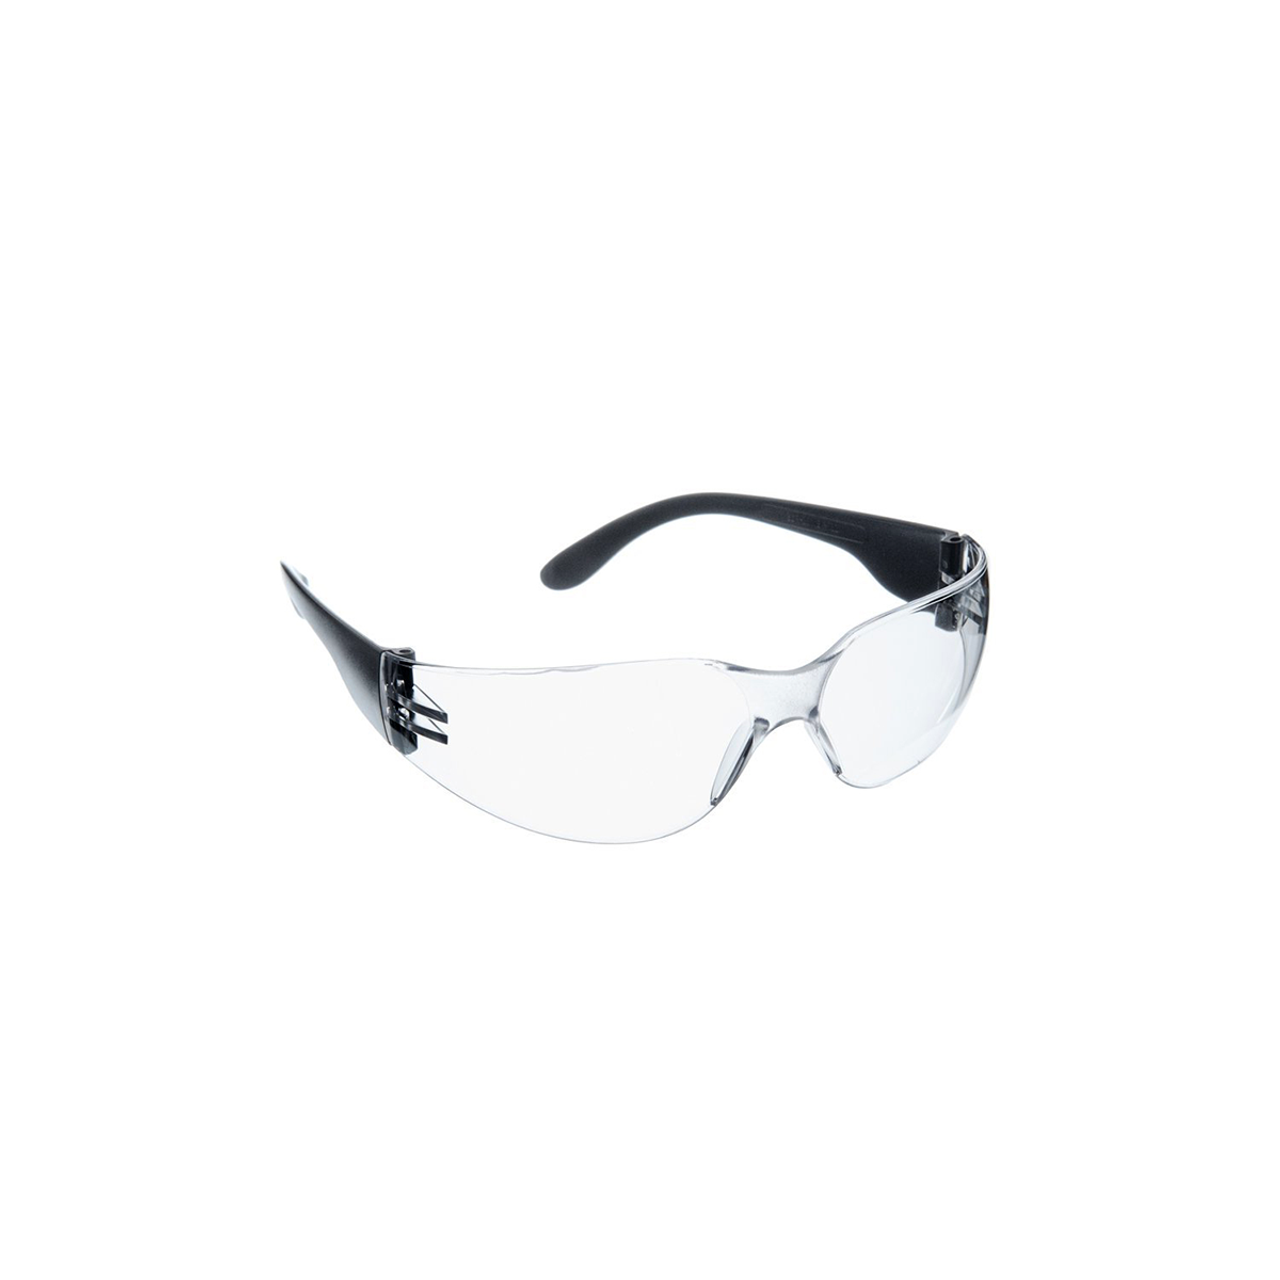 Safety Glasses - Lightweight